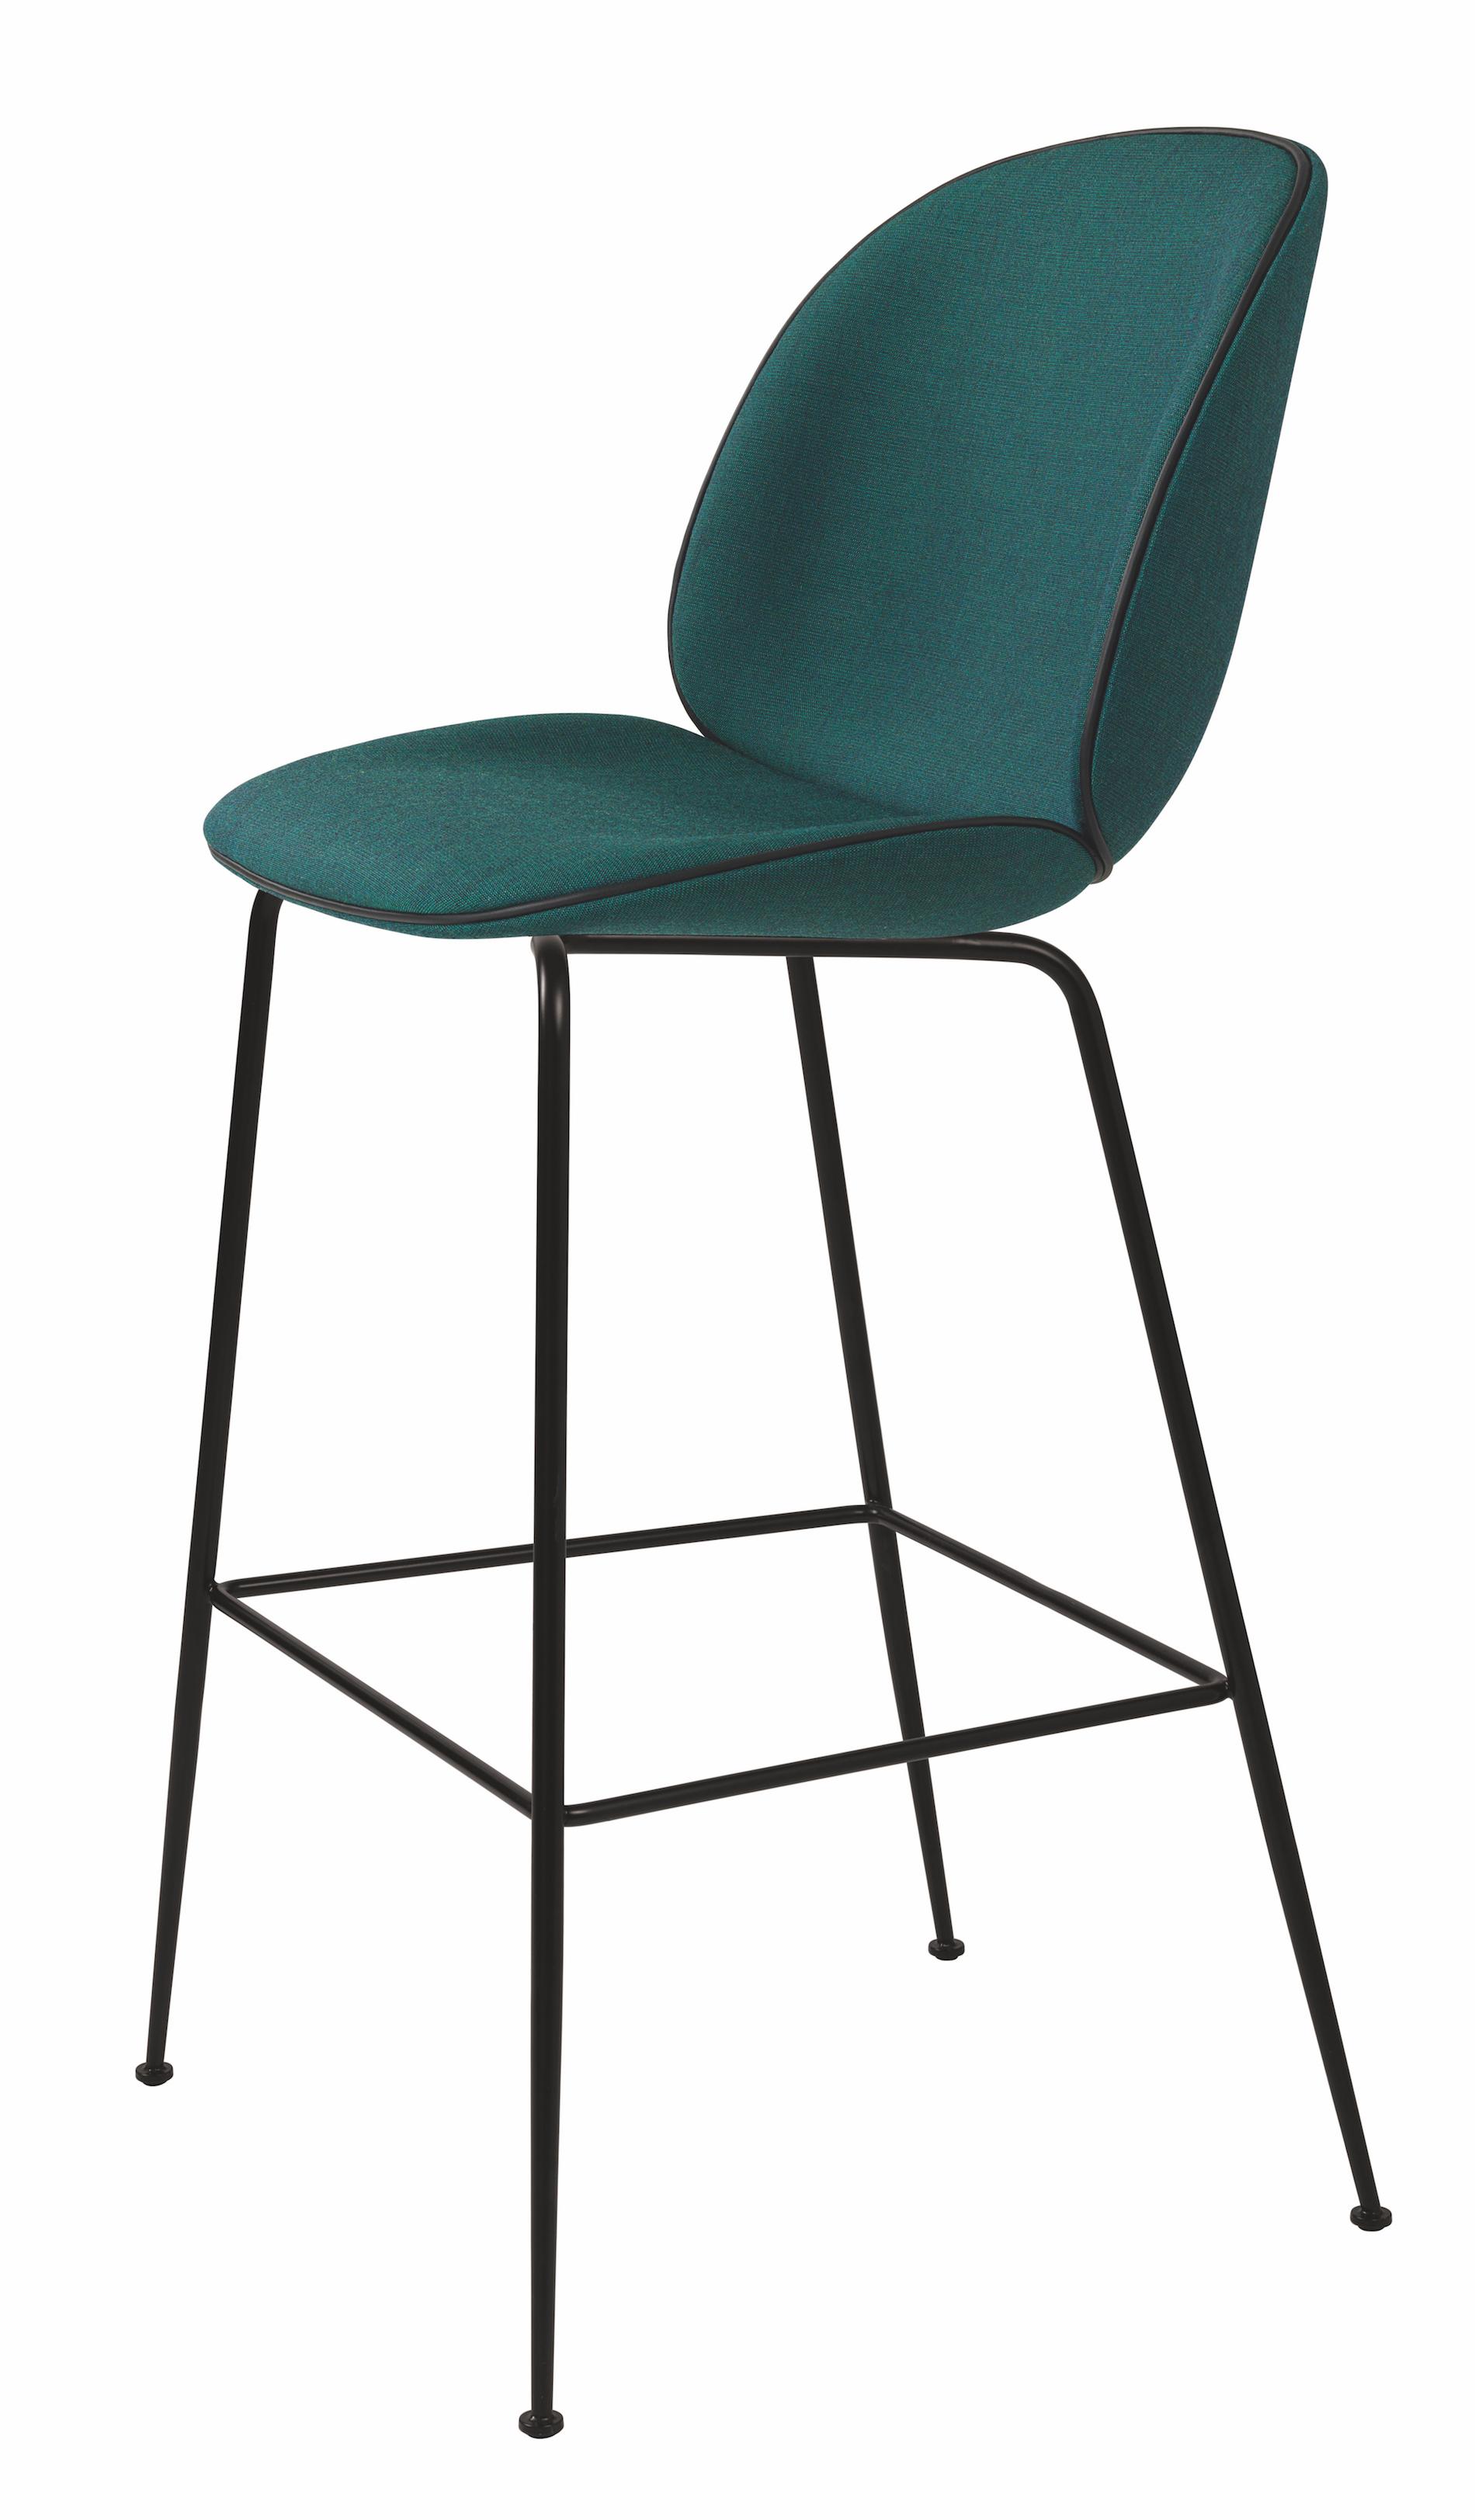 gubi chaise de bar beetle design gamfratesi. Black Bedroom Furniture Sets. Home Design Ideas